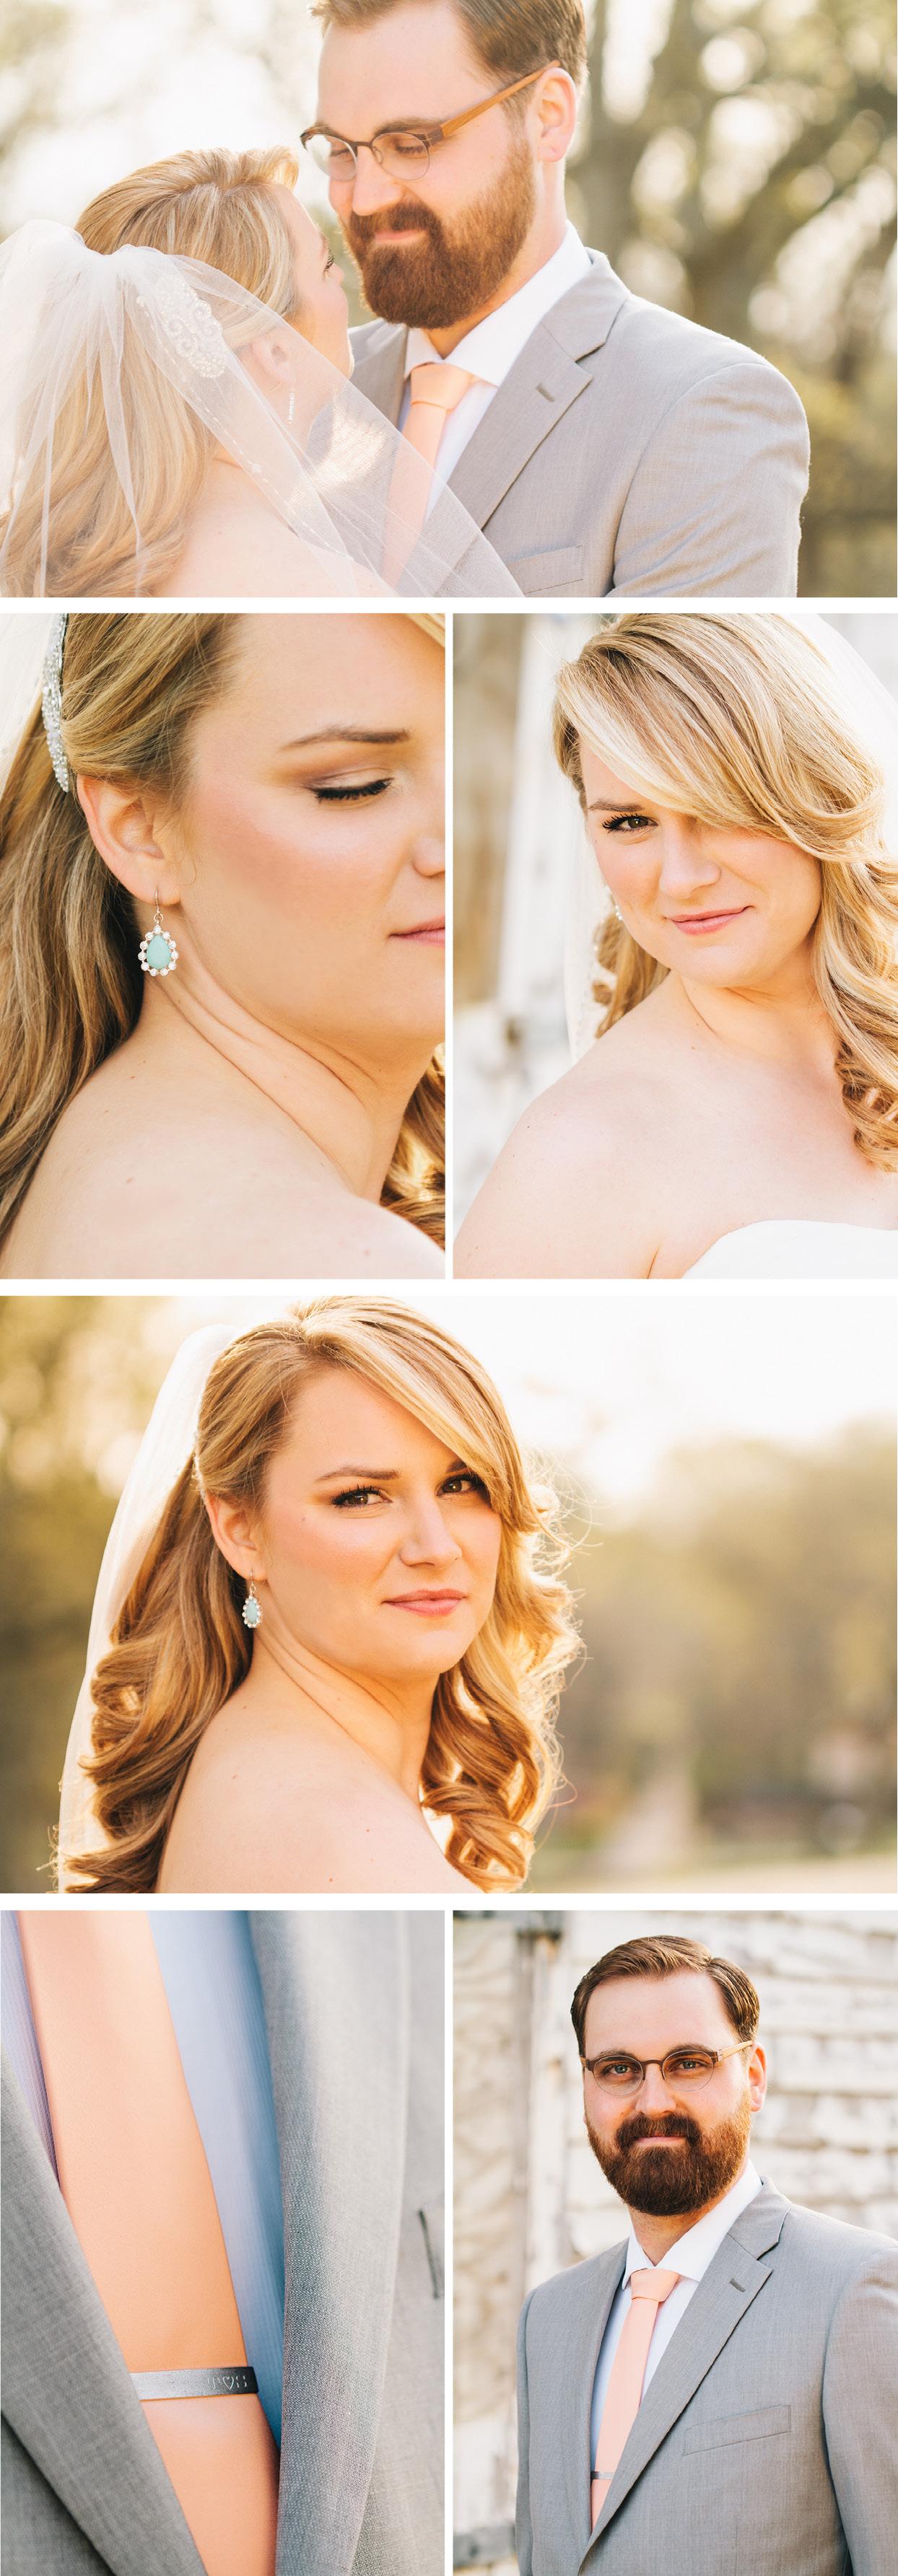 CK-Photo-Nashville-Wedding-Photographer-ST6.jpg